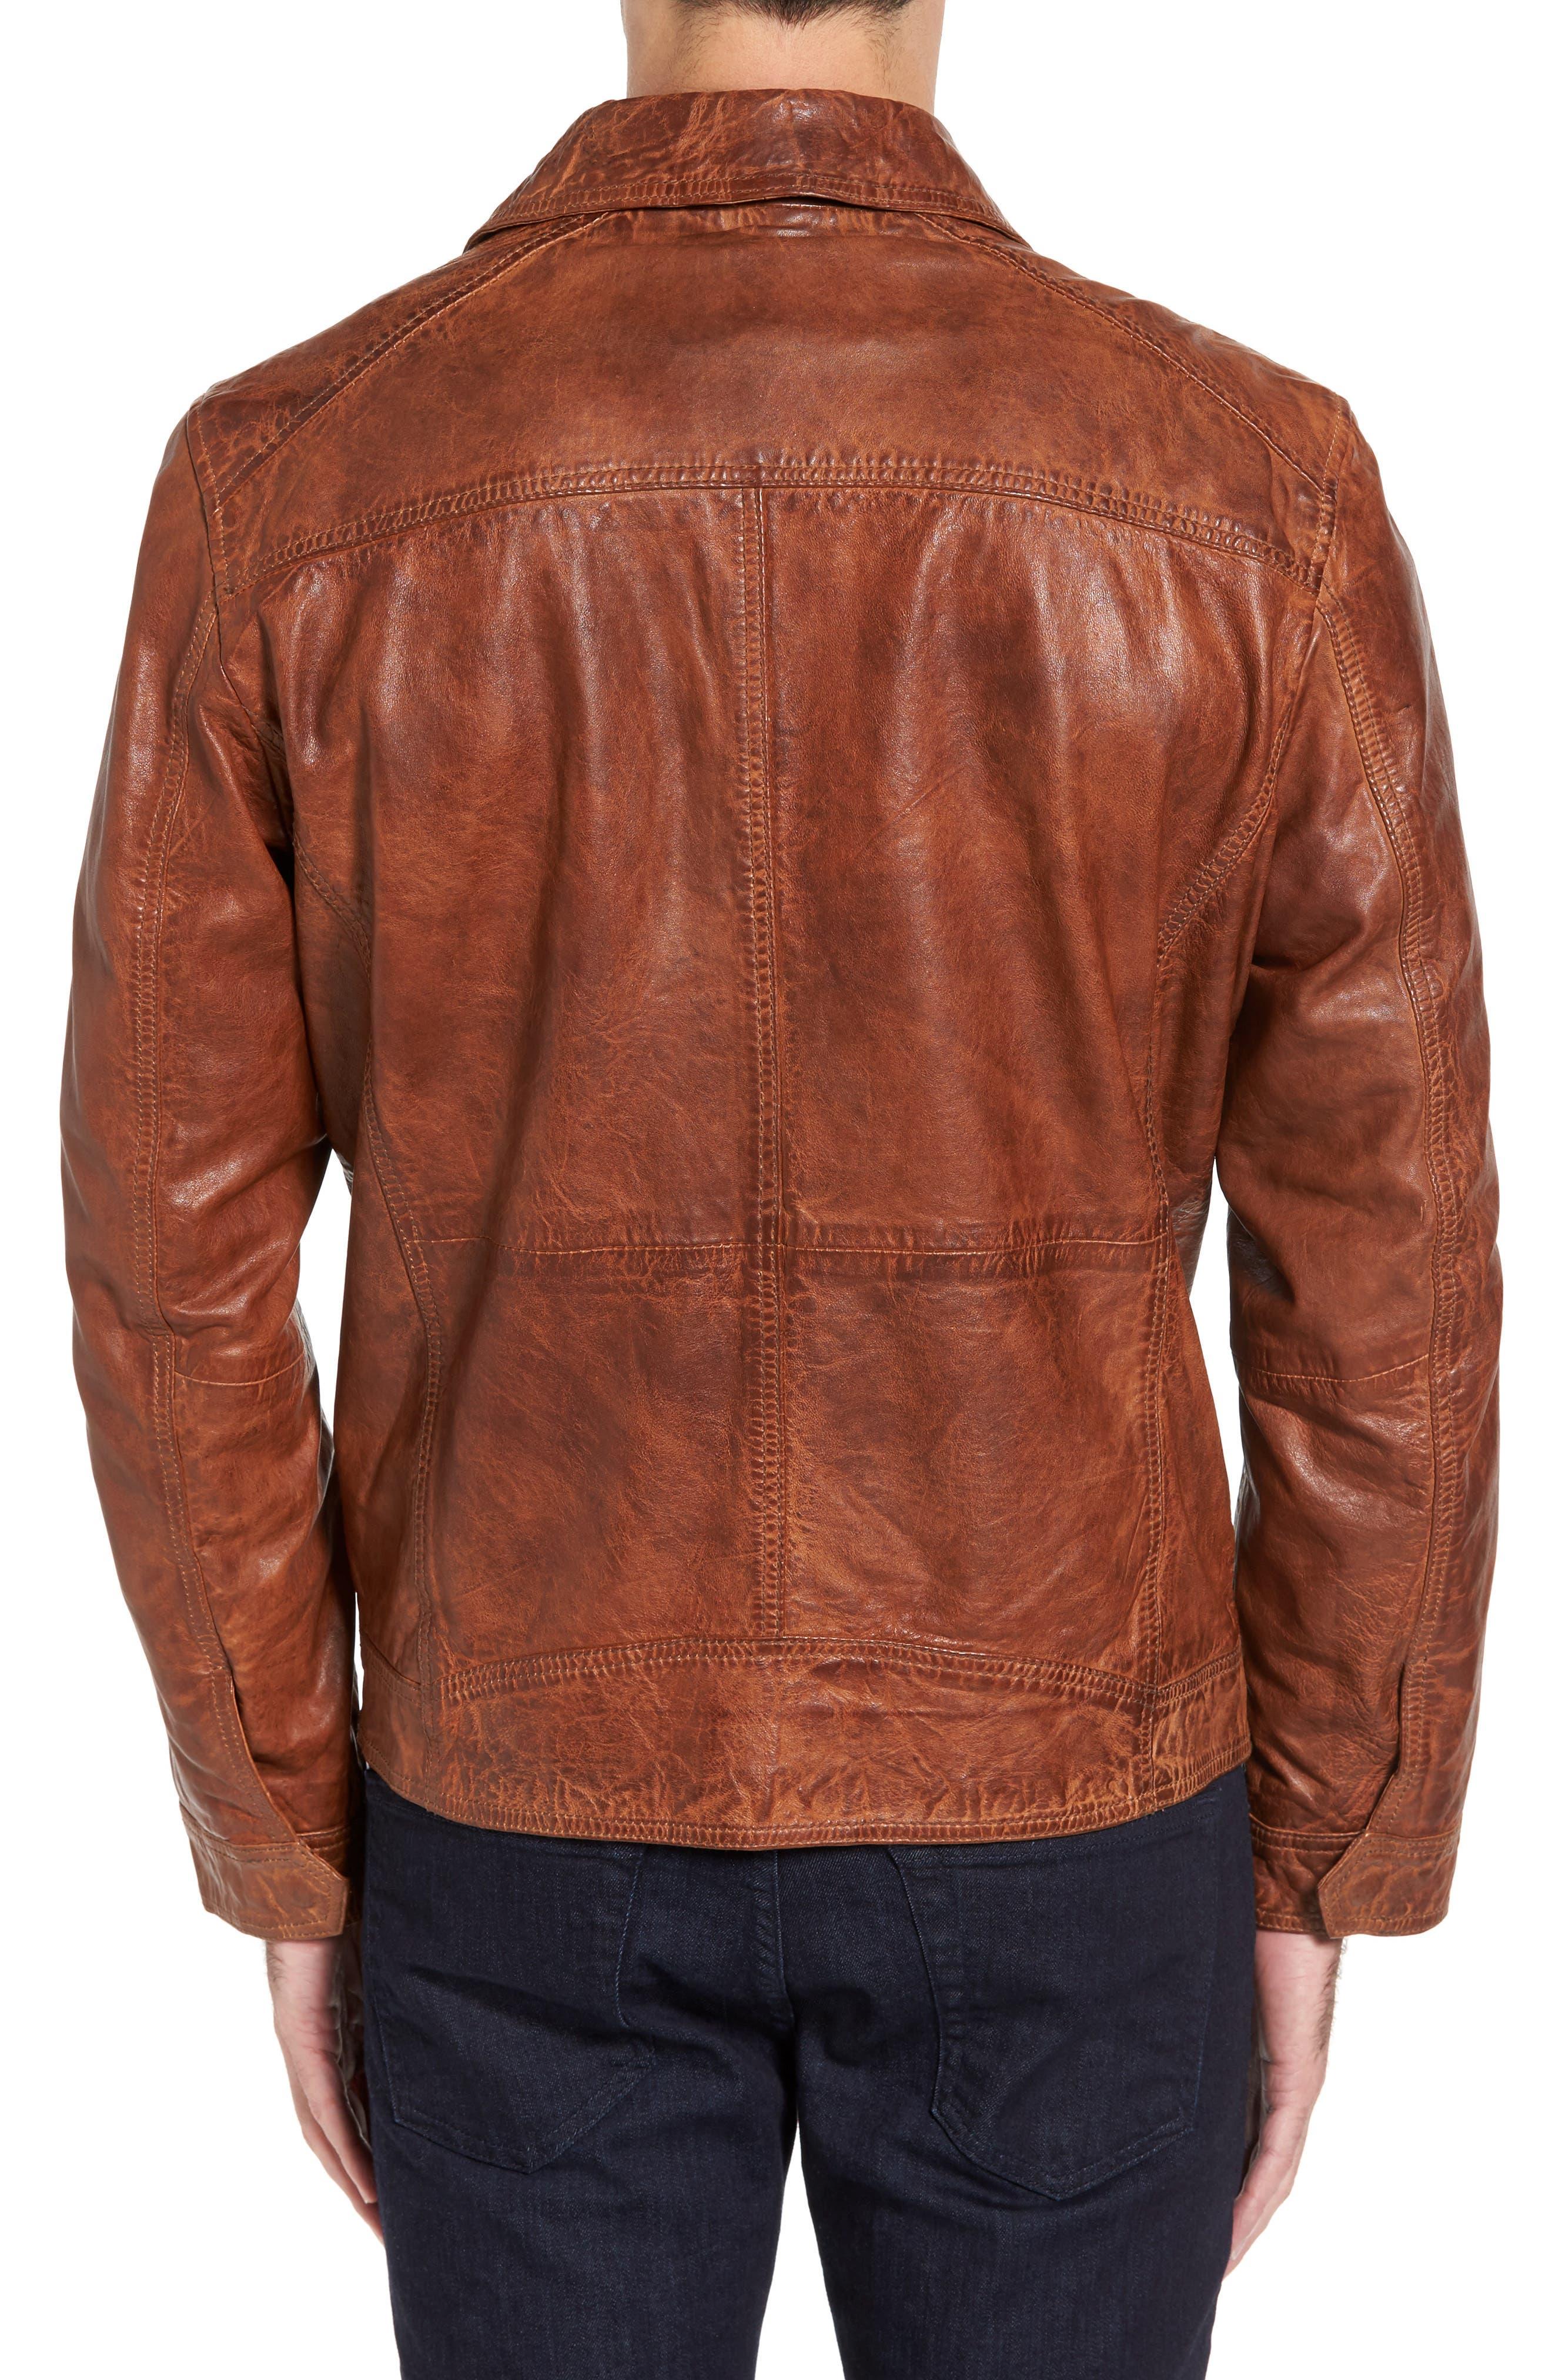 Washed Lamb Leather Jacket,                             Alternate thumbnail 2, color,                             210